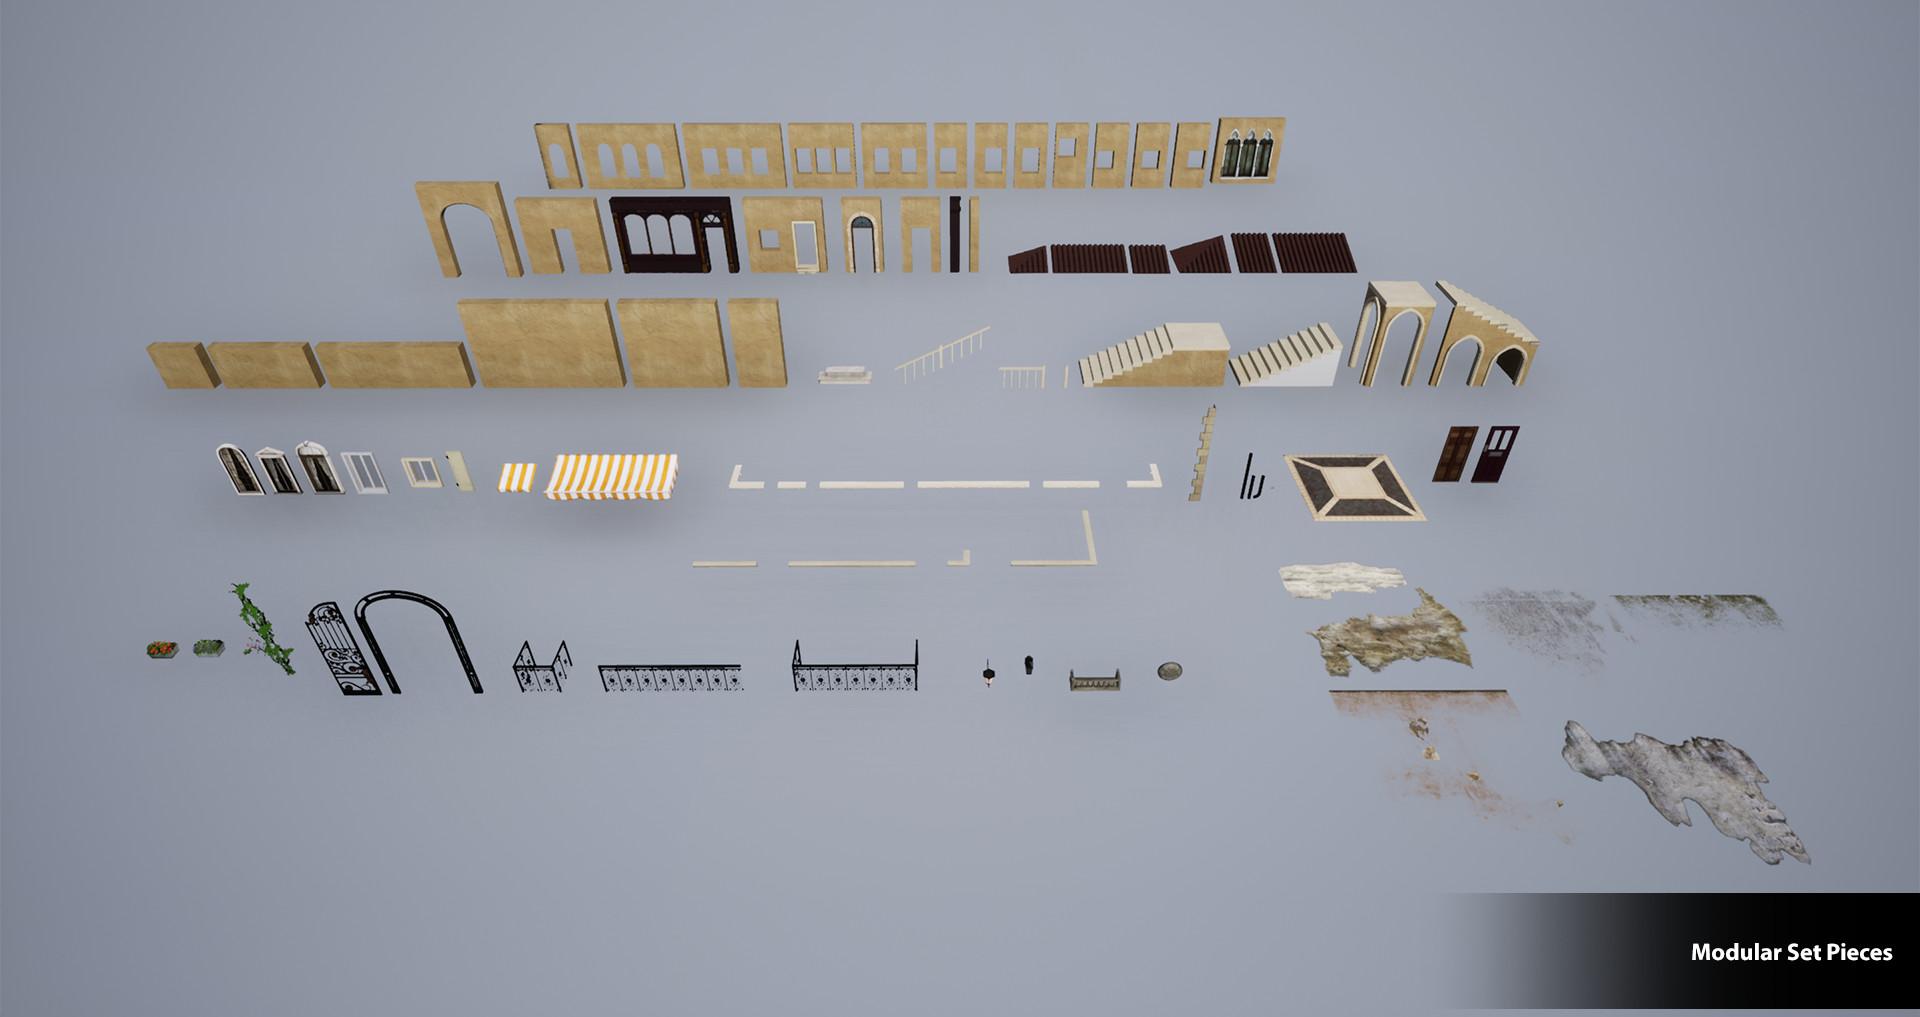 Brenna blackman modular set